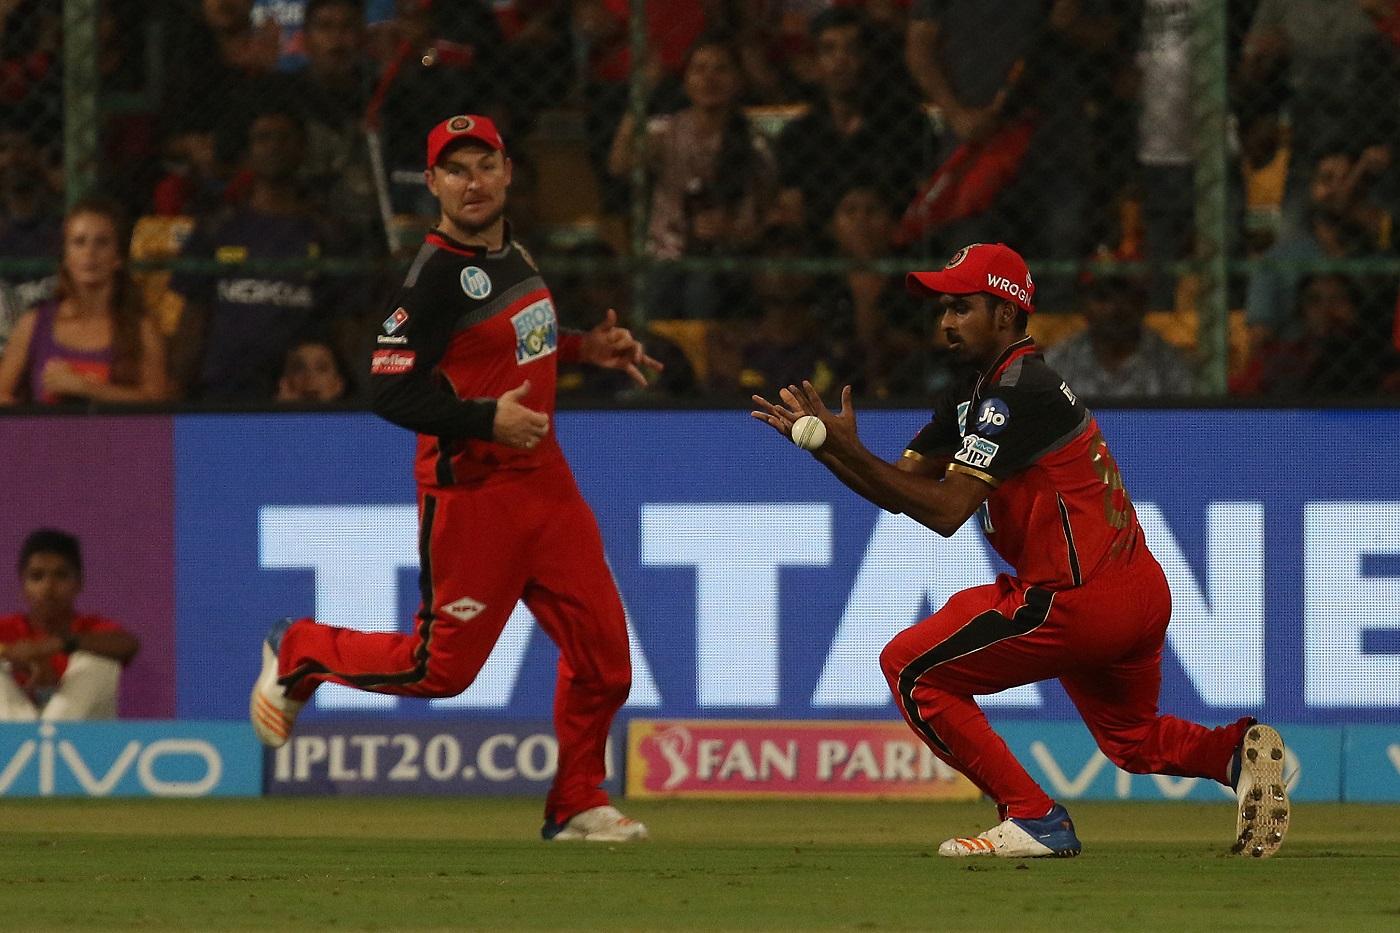 IPL 2018: If We Field Like That, We Don't Deserve To Win - Virat Kohli 3